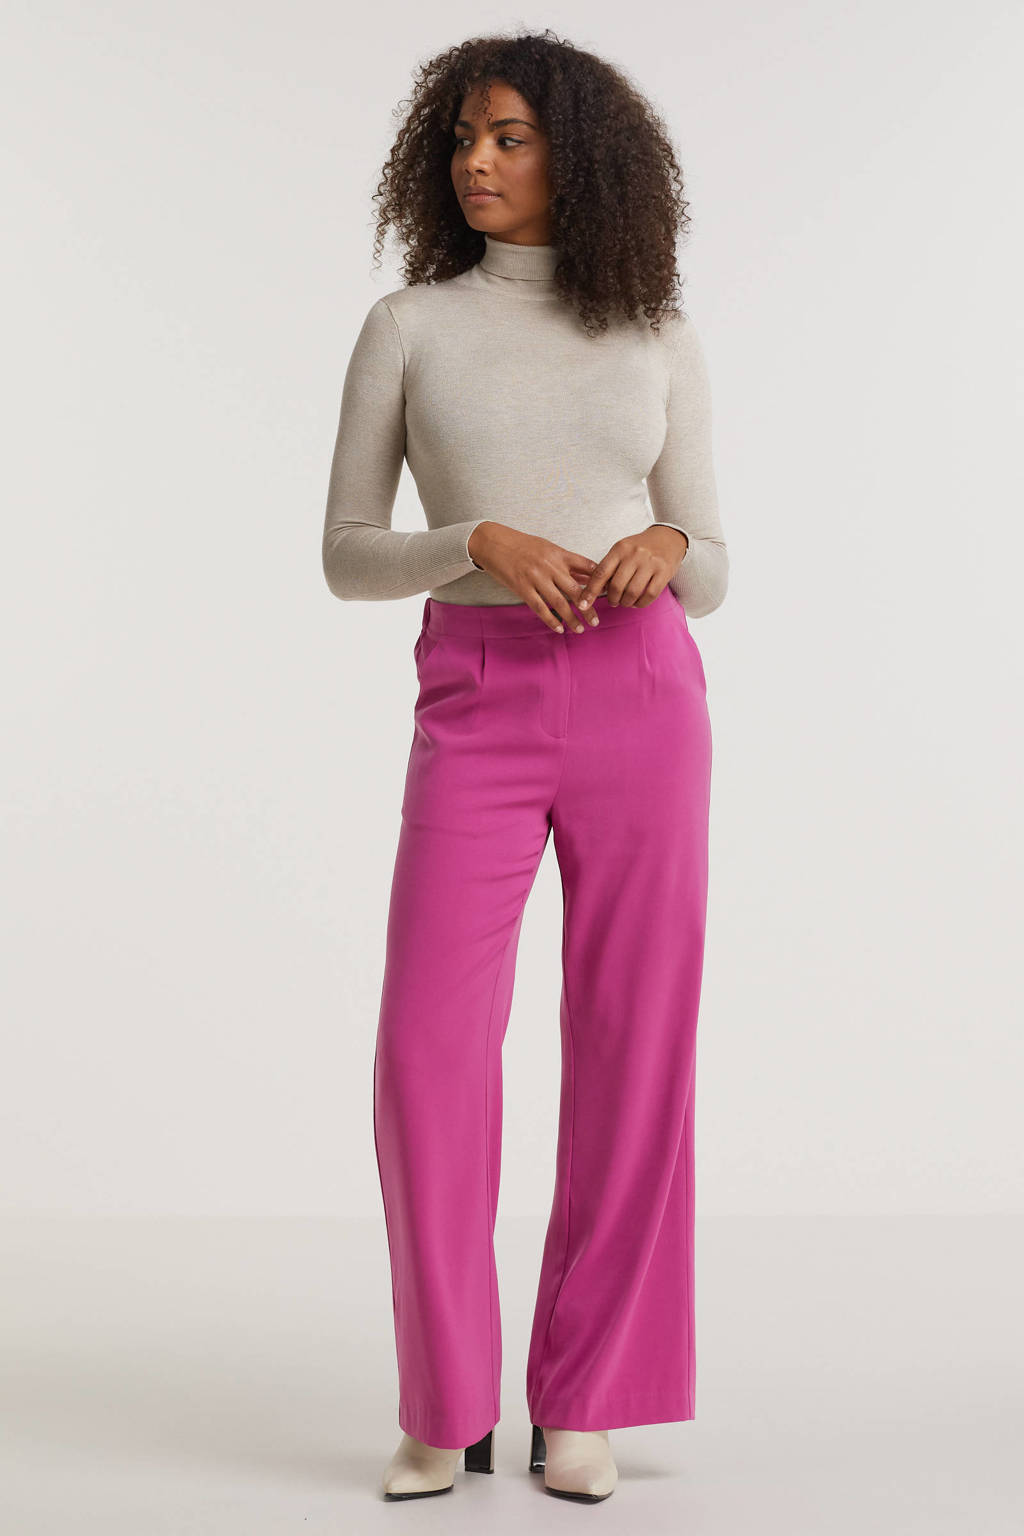 Ydence high waist wide leg pantalon Pants Solange purple, Purple